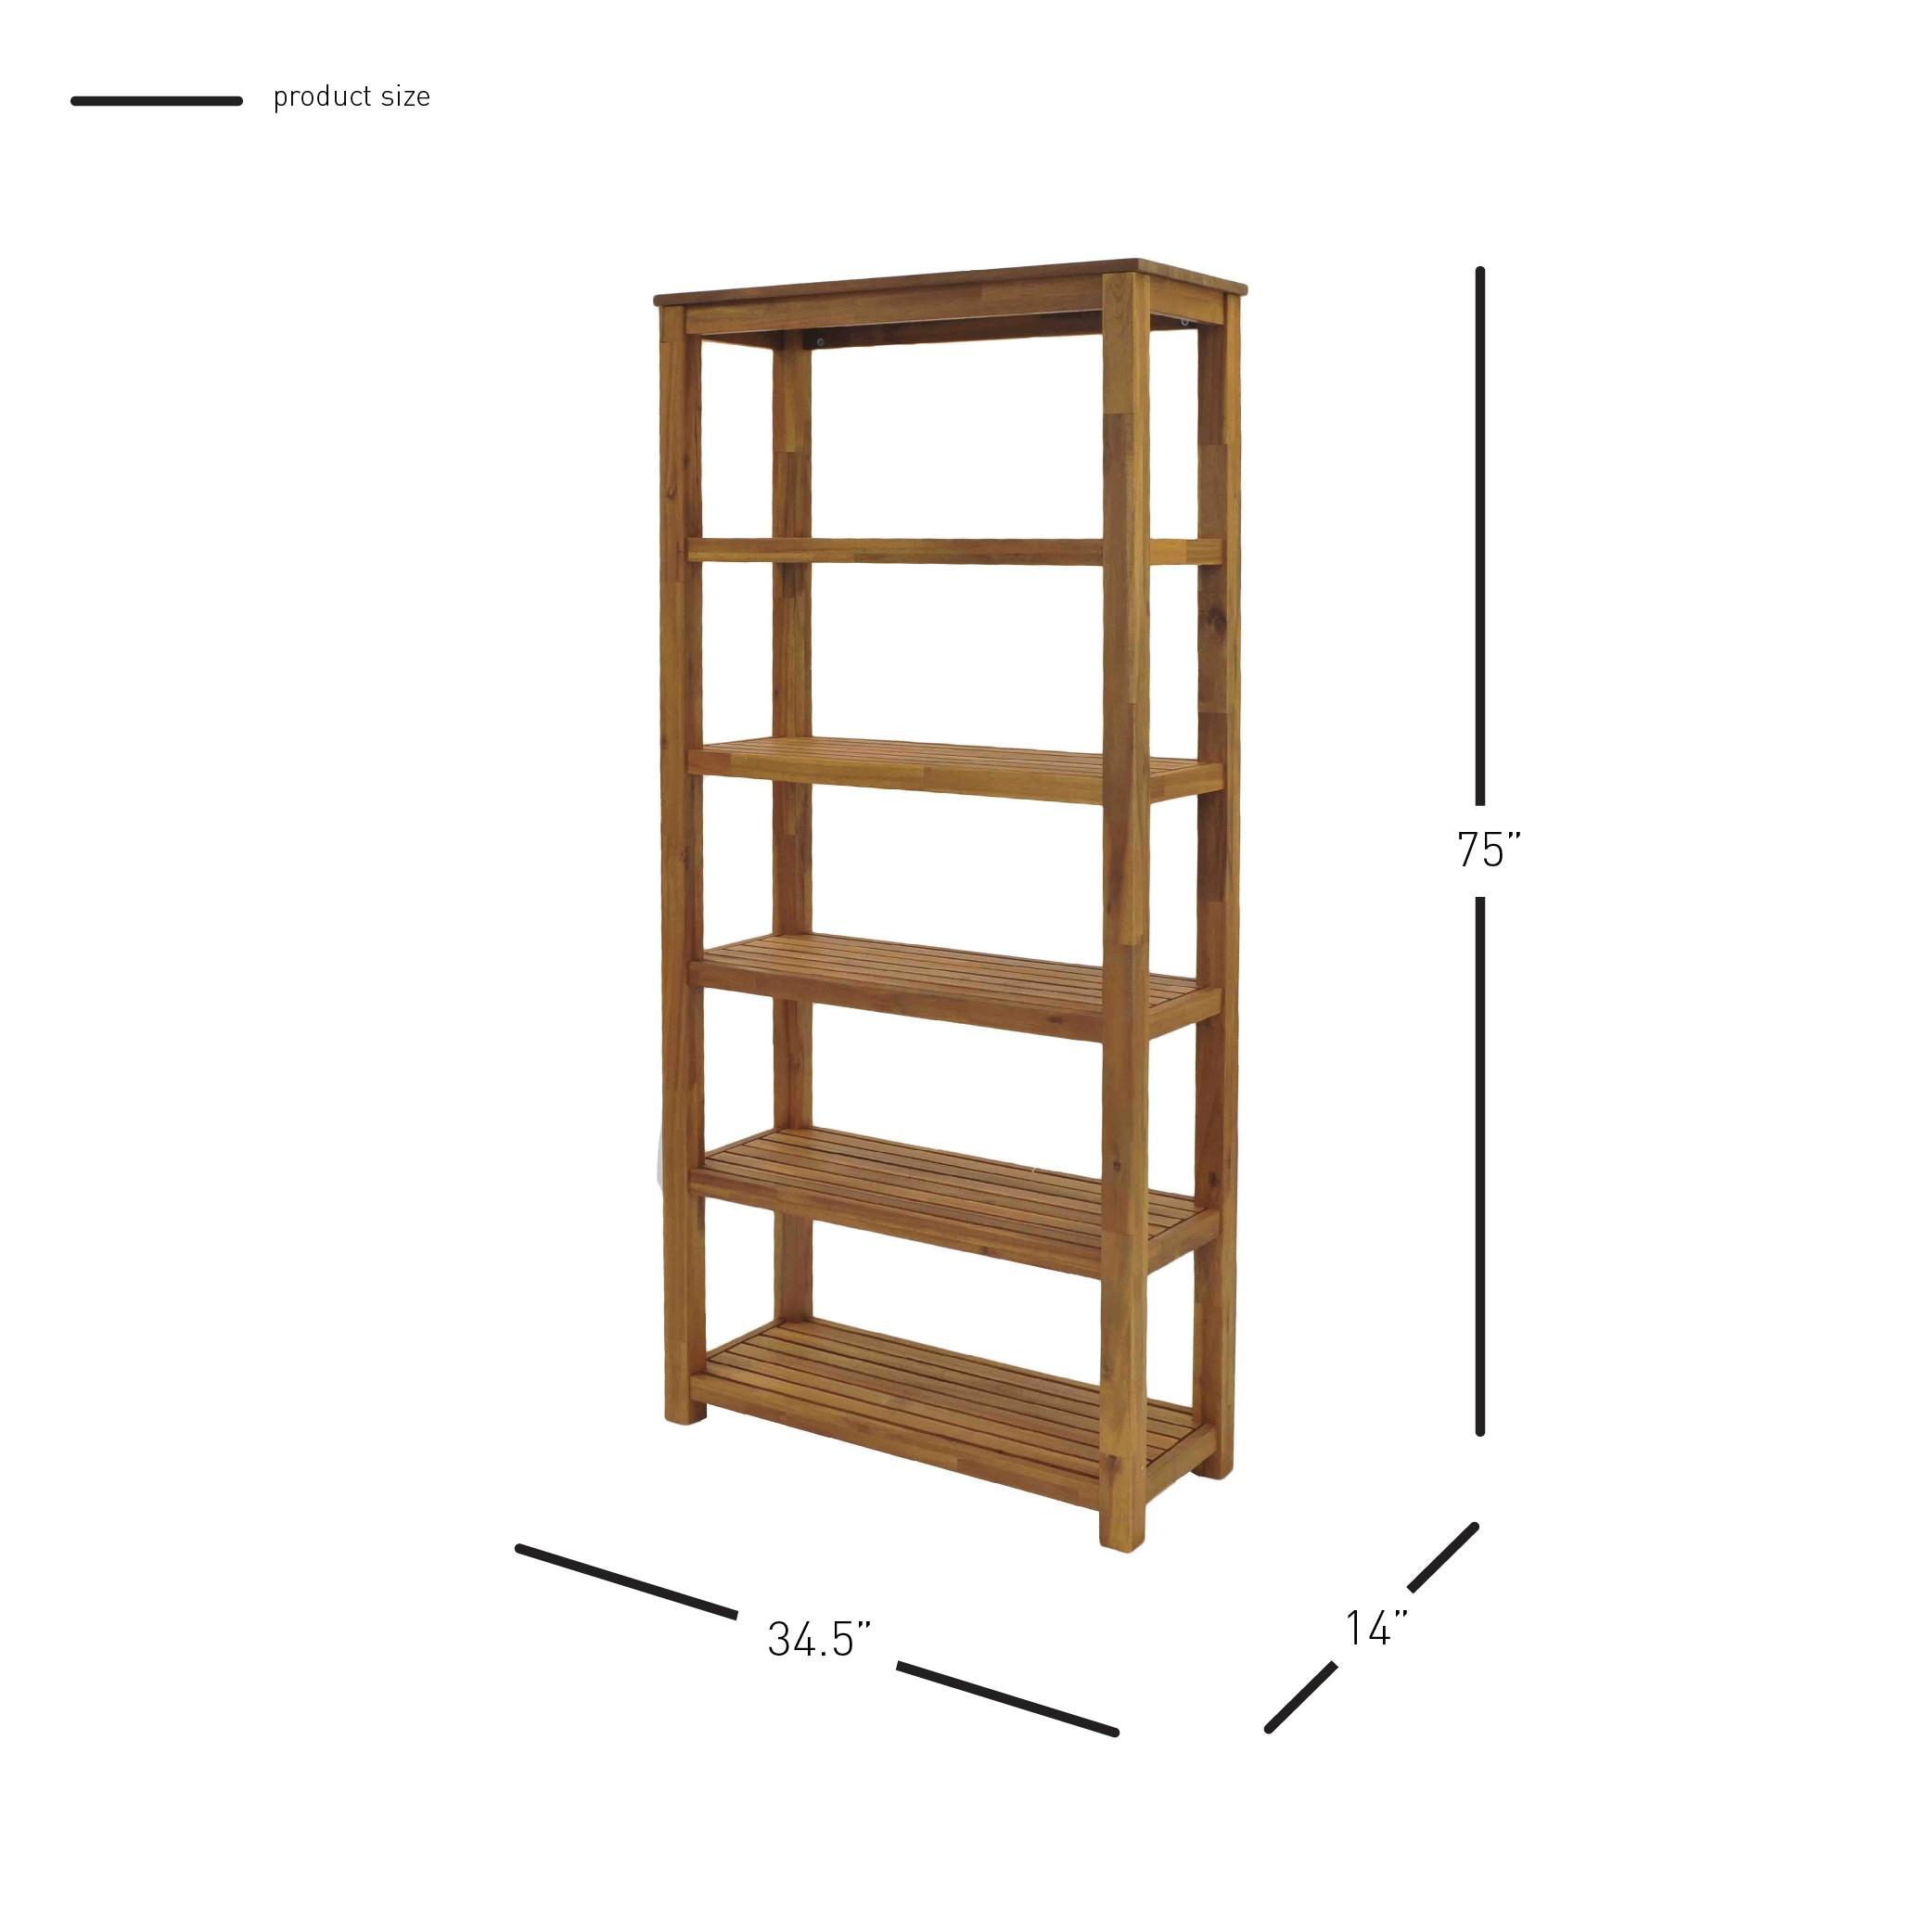 802275 118 Npd Home Furniture Wholesale Lifestyle